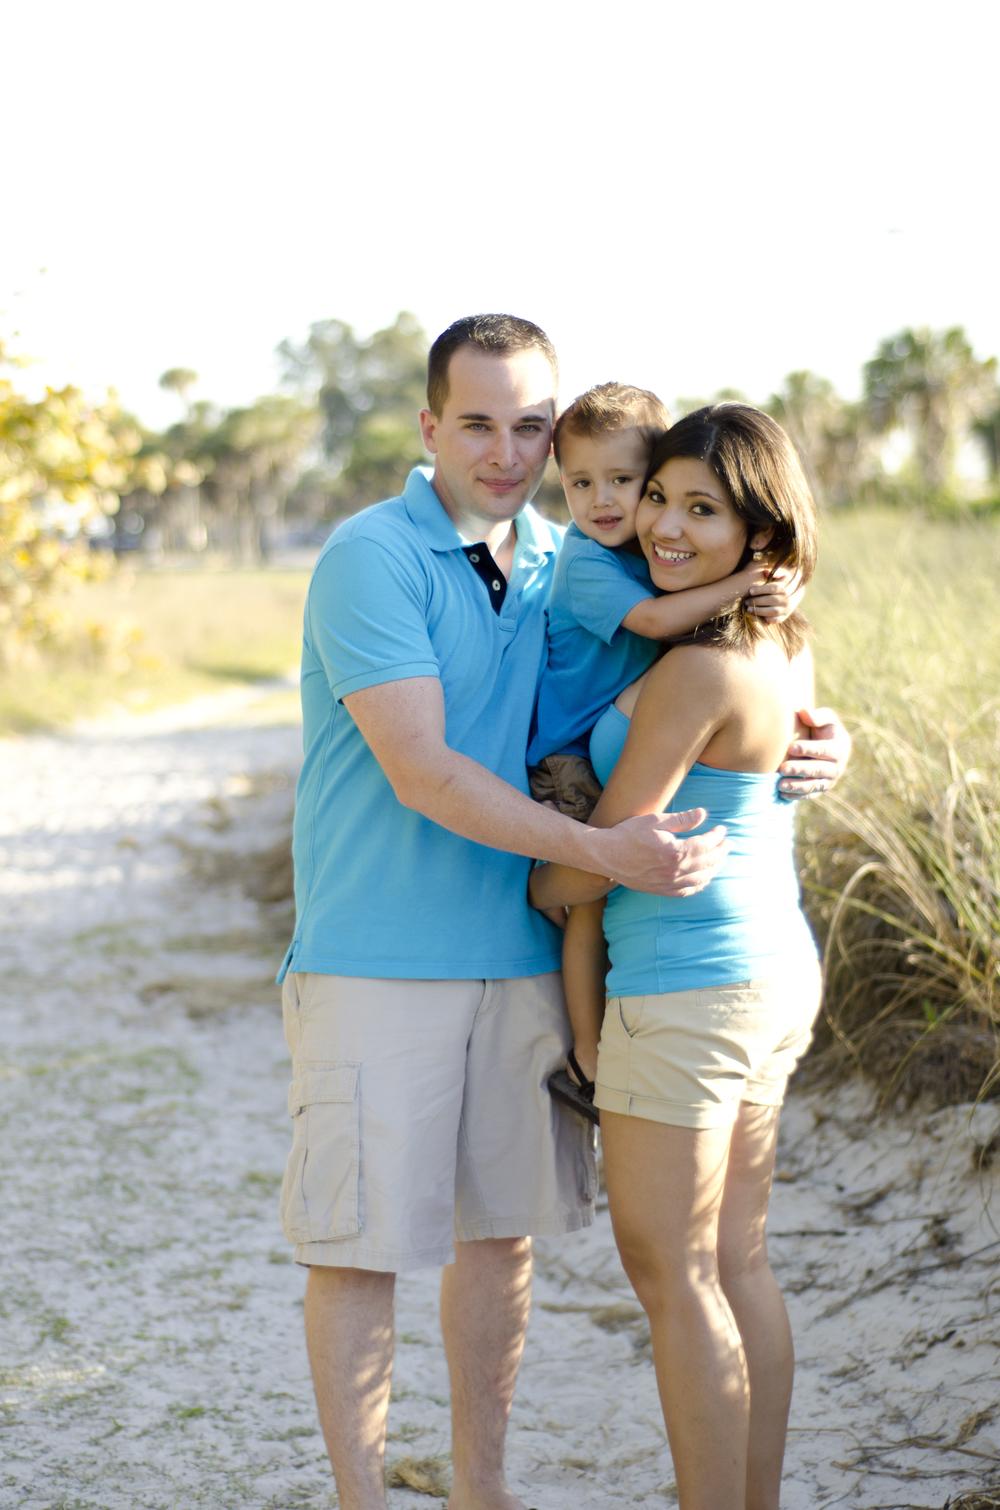 Beach Photographer - Tampa Family Photos